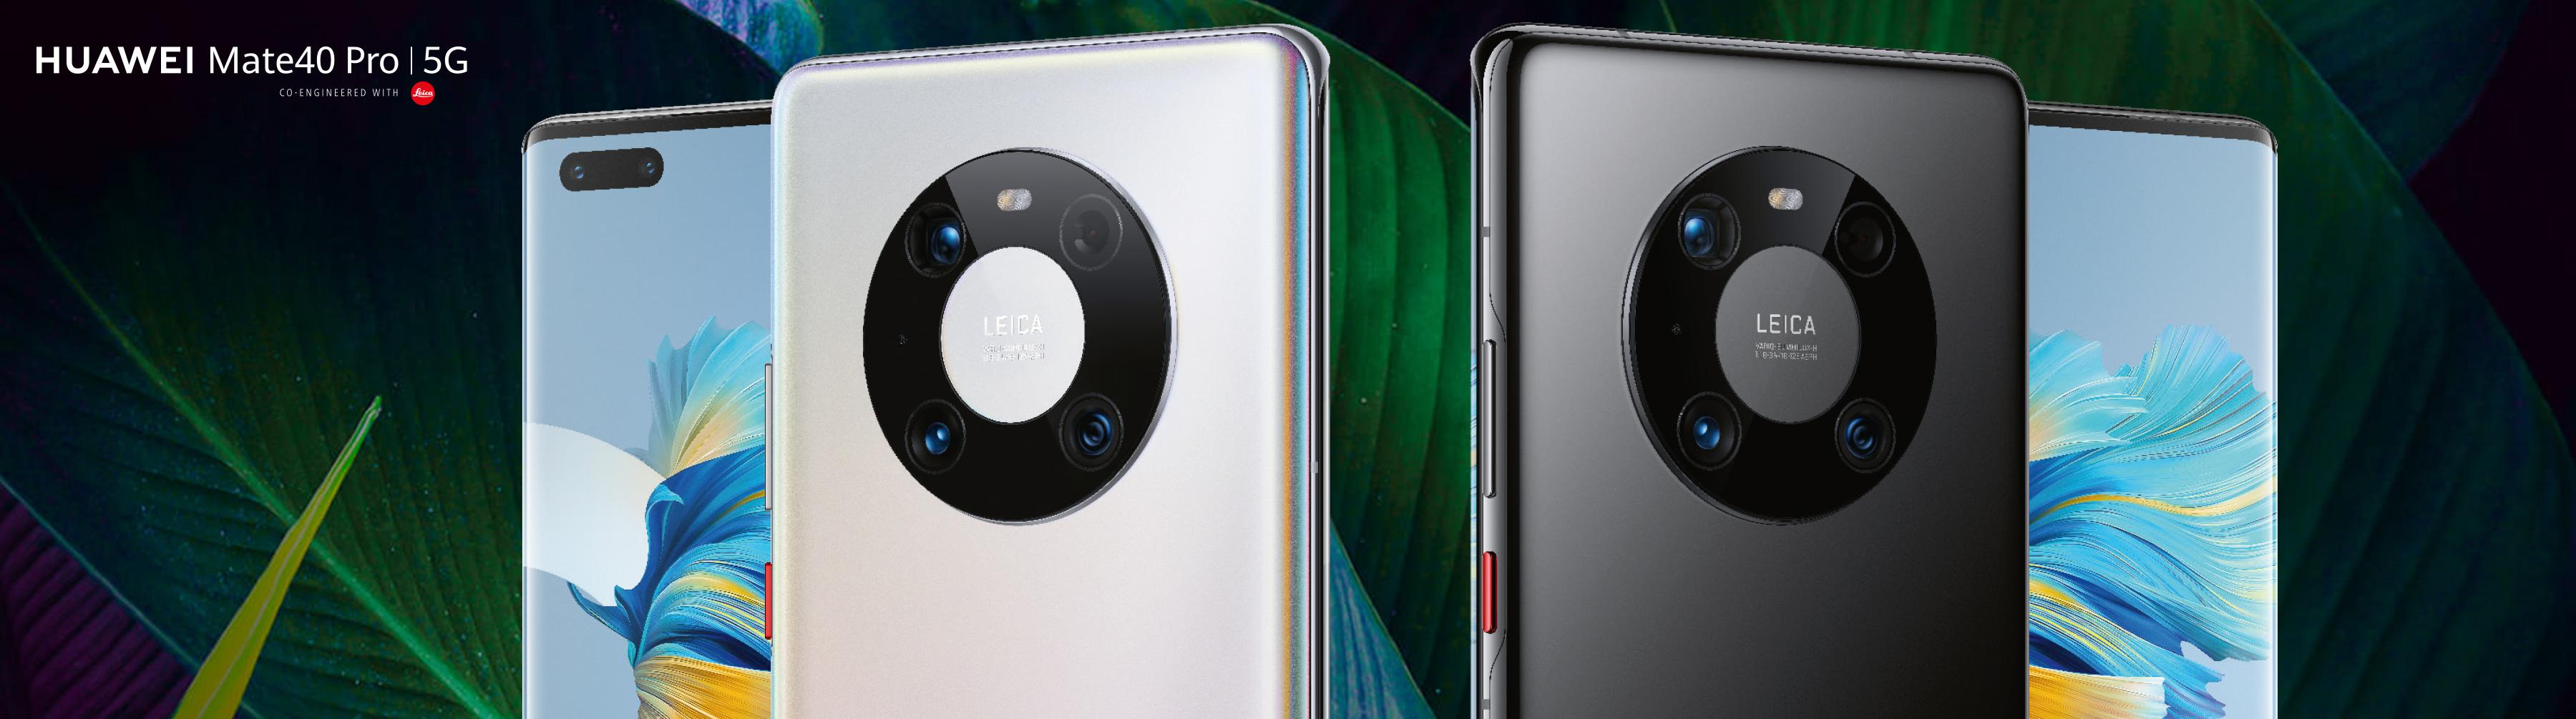 HUAWEI Mate 40 Pro: Das neue 5G-Handy